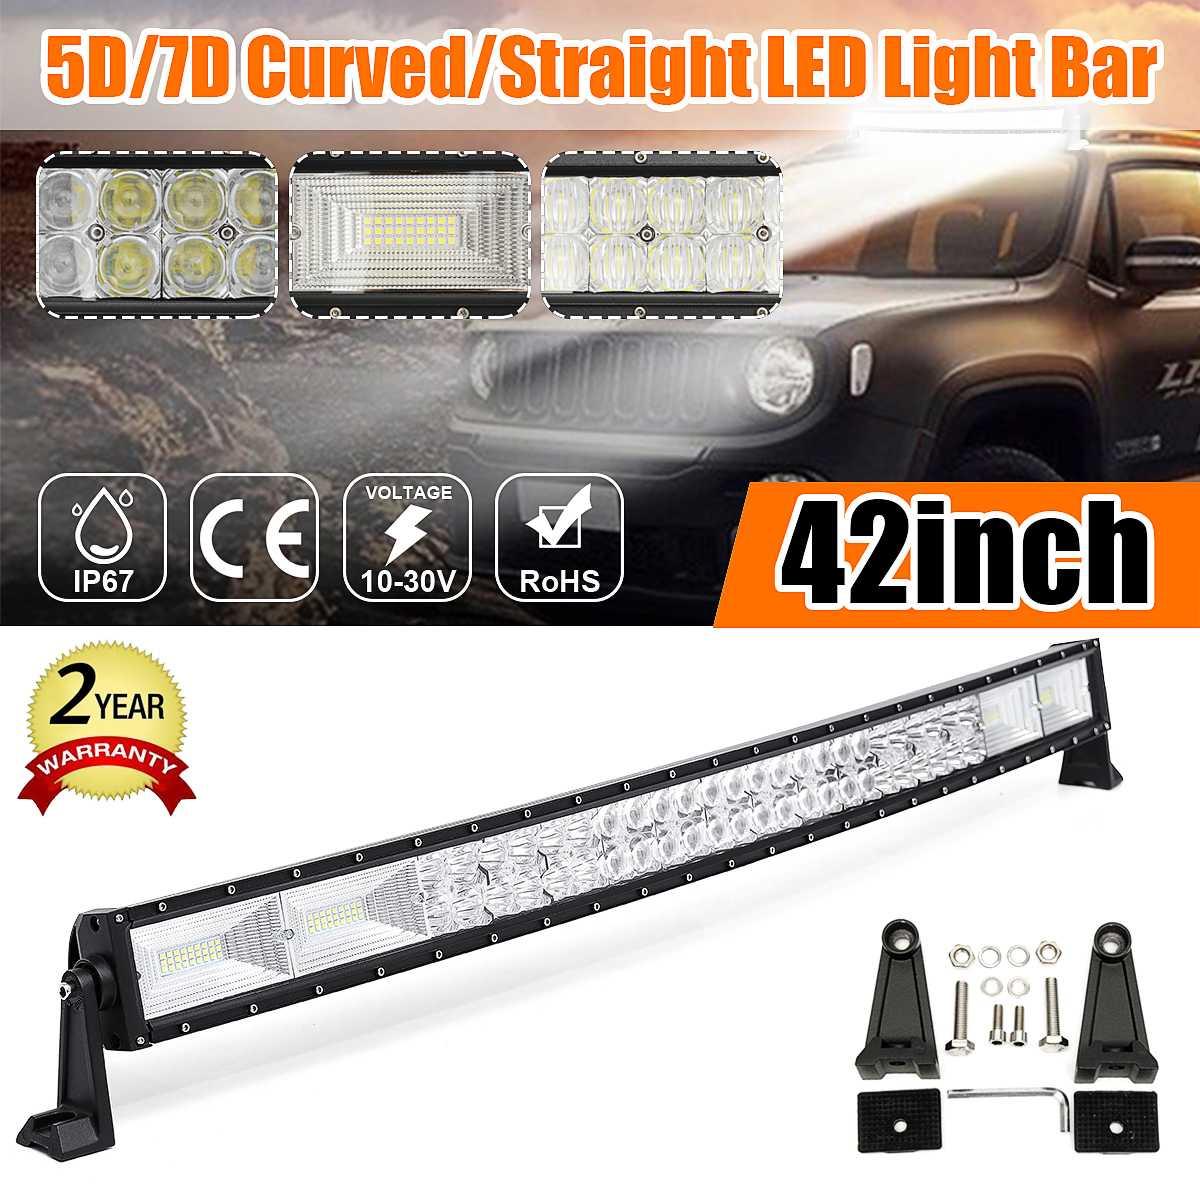 Barra de luz LED de obra curvada de 42 pulgadas 1400W 5D Combo de lámpara de conducción todoterreno 6000K Barra de luz LED impermeable para SUV ATV coche camión